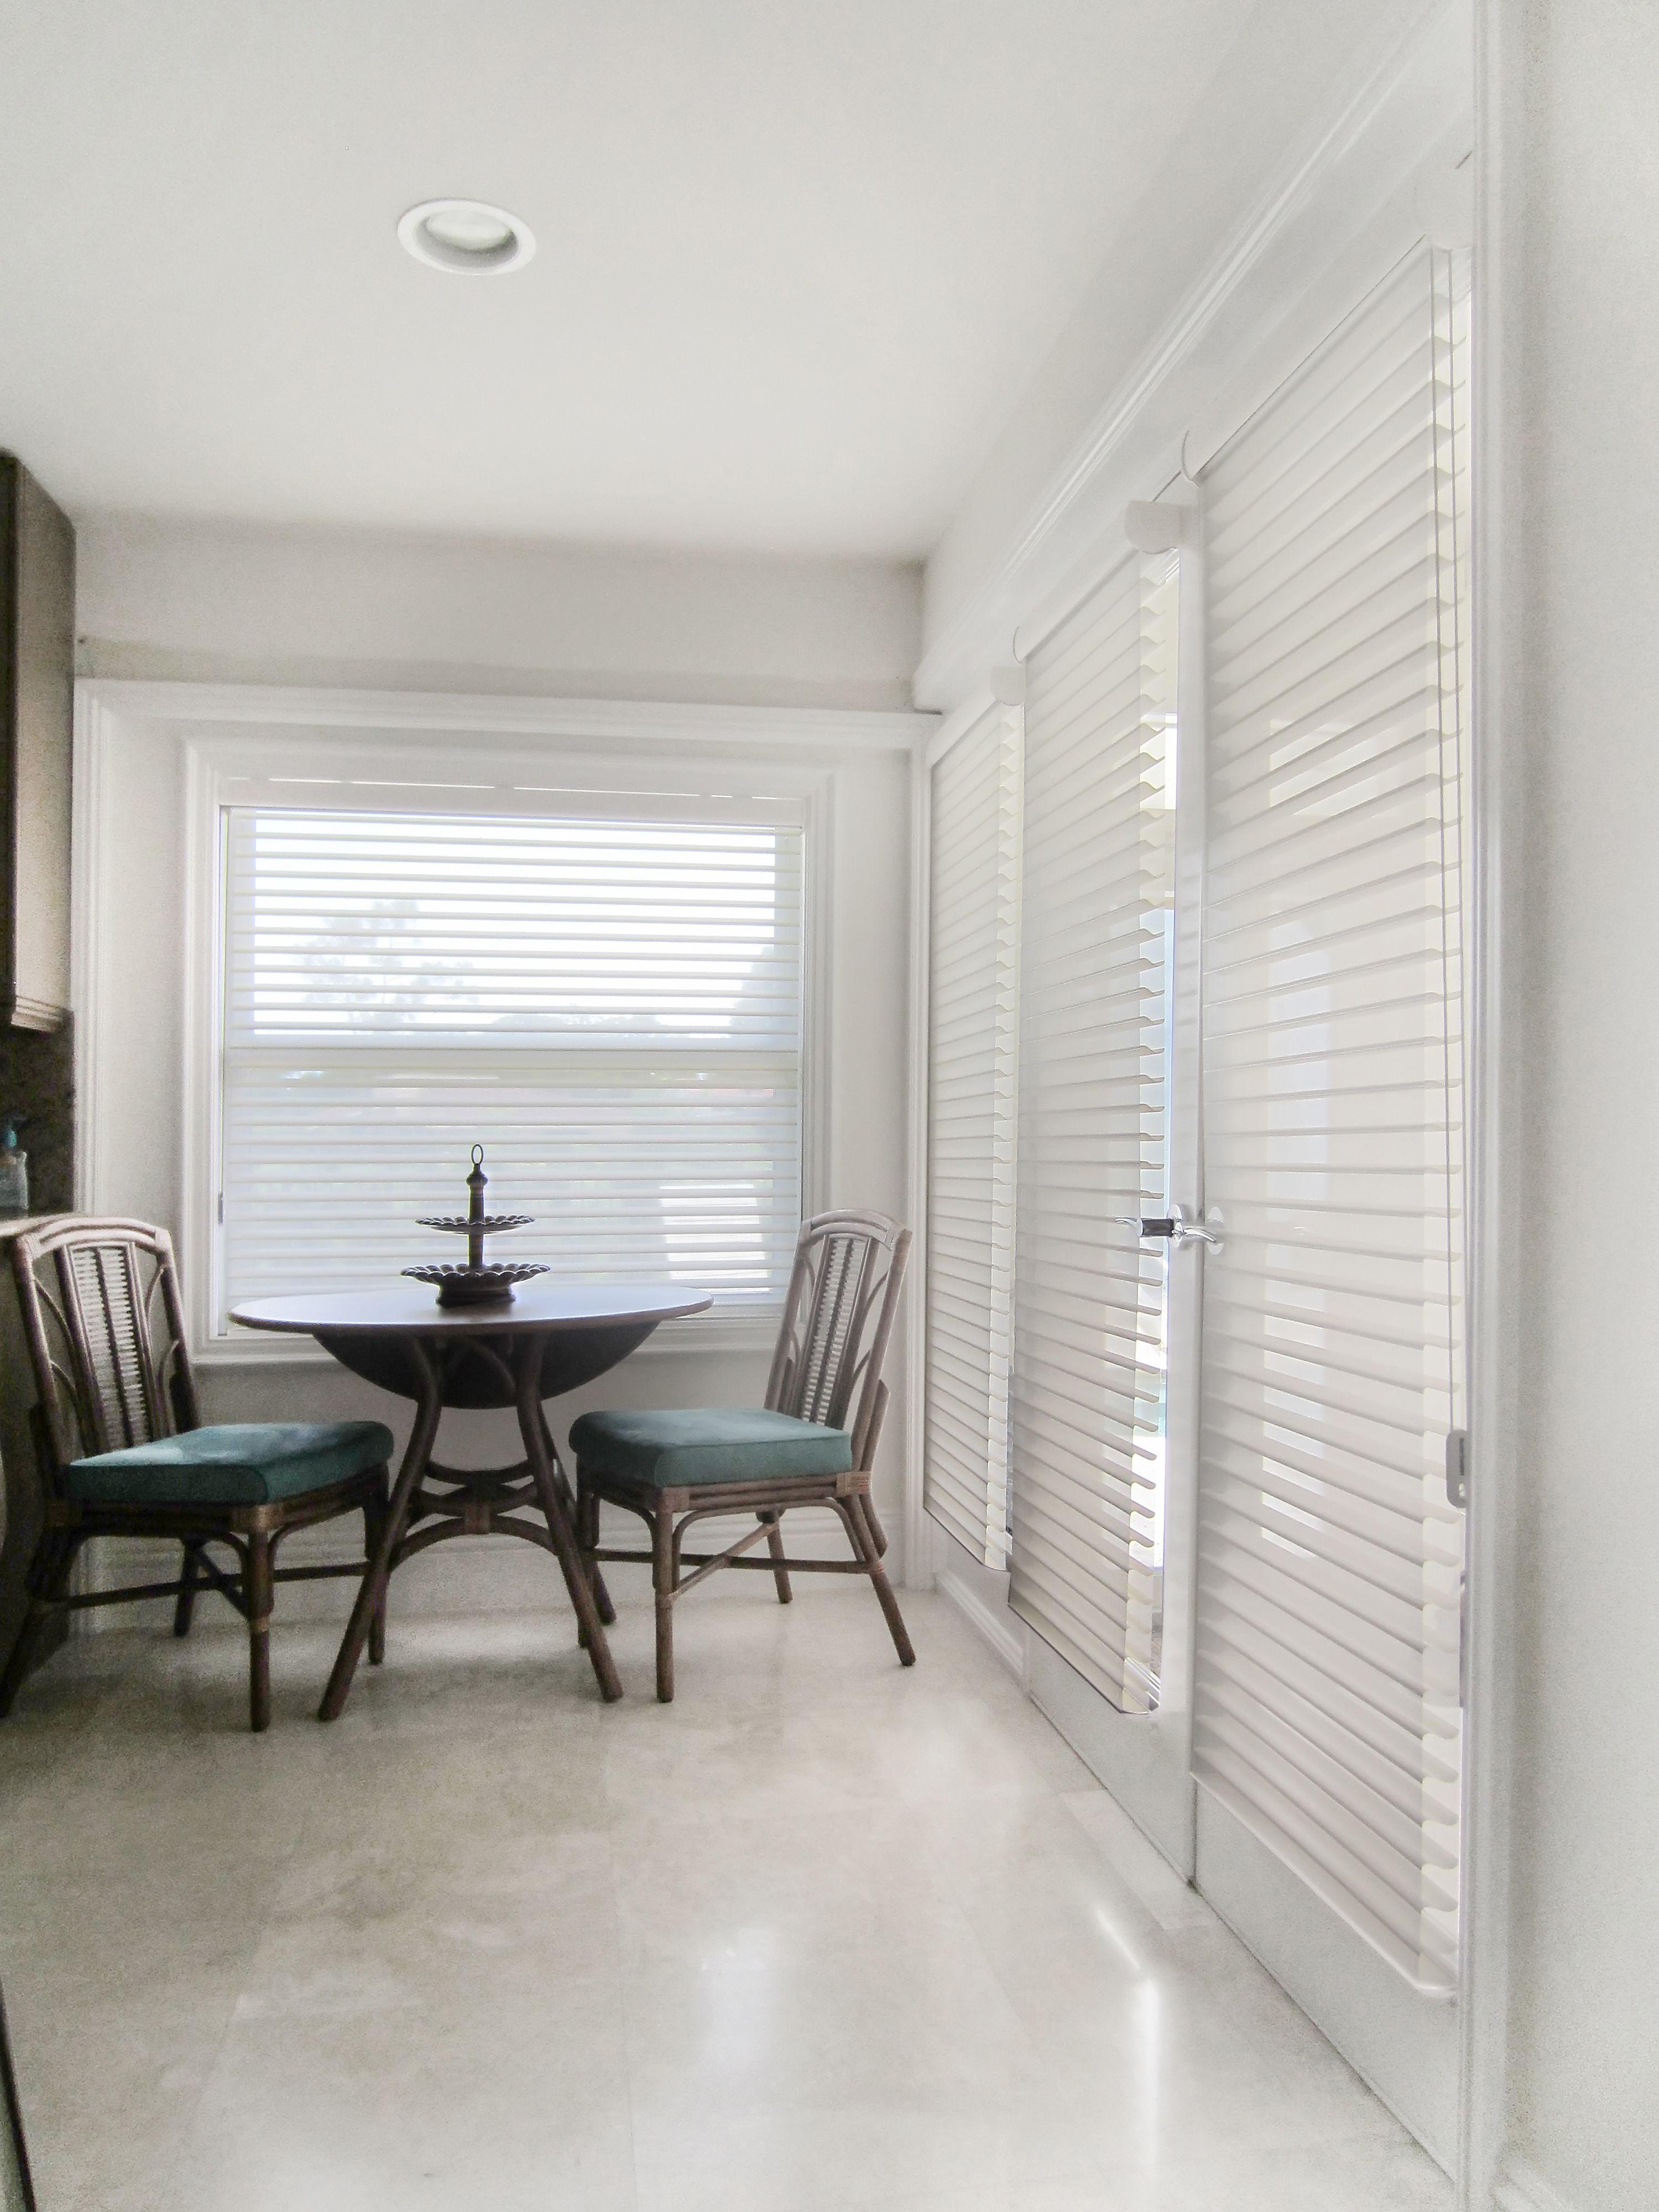 Kitchen window treatment ideas  hunter douglas easy rise silhouette shades  kitchen window